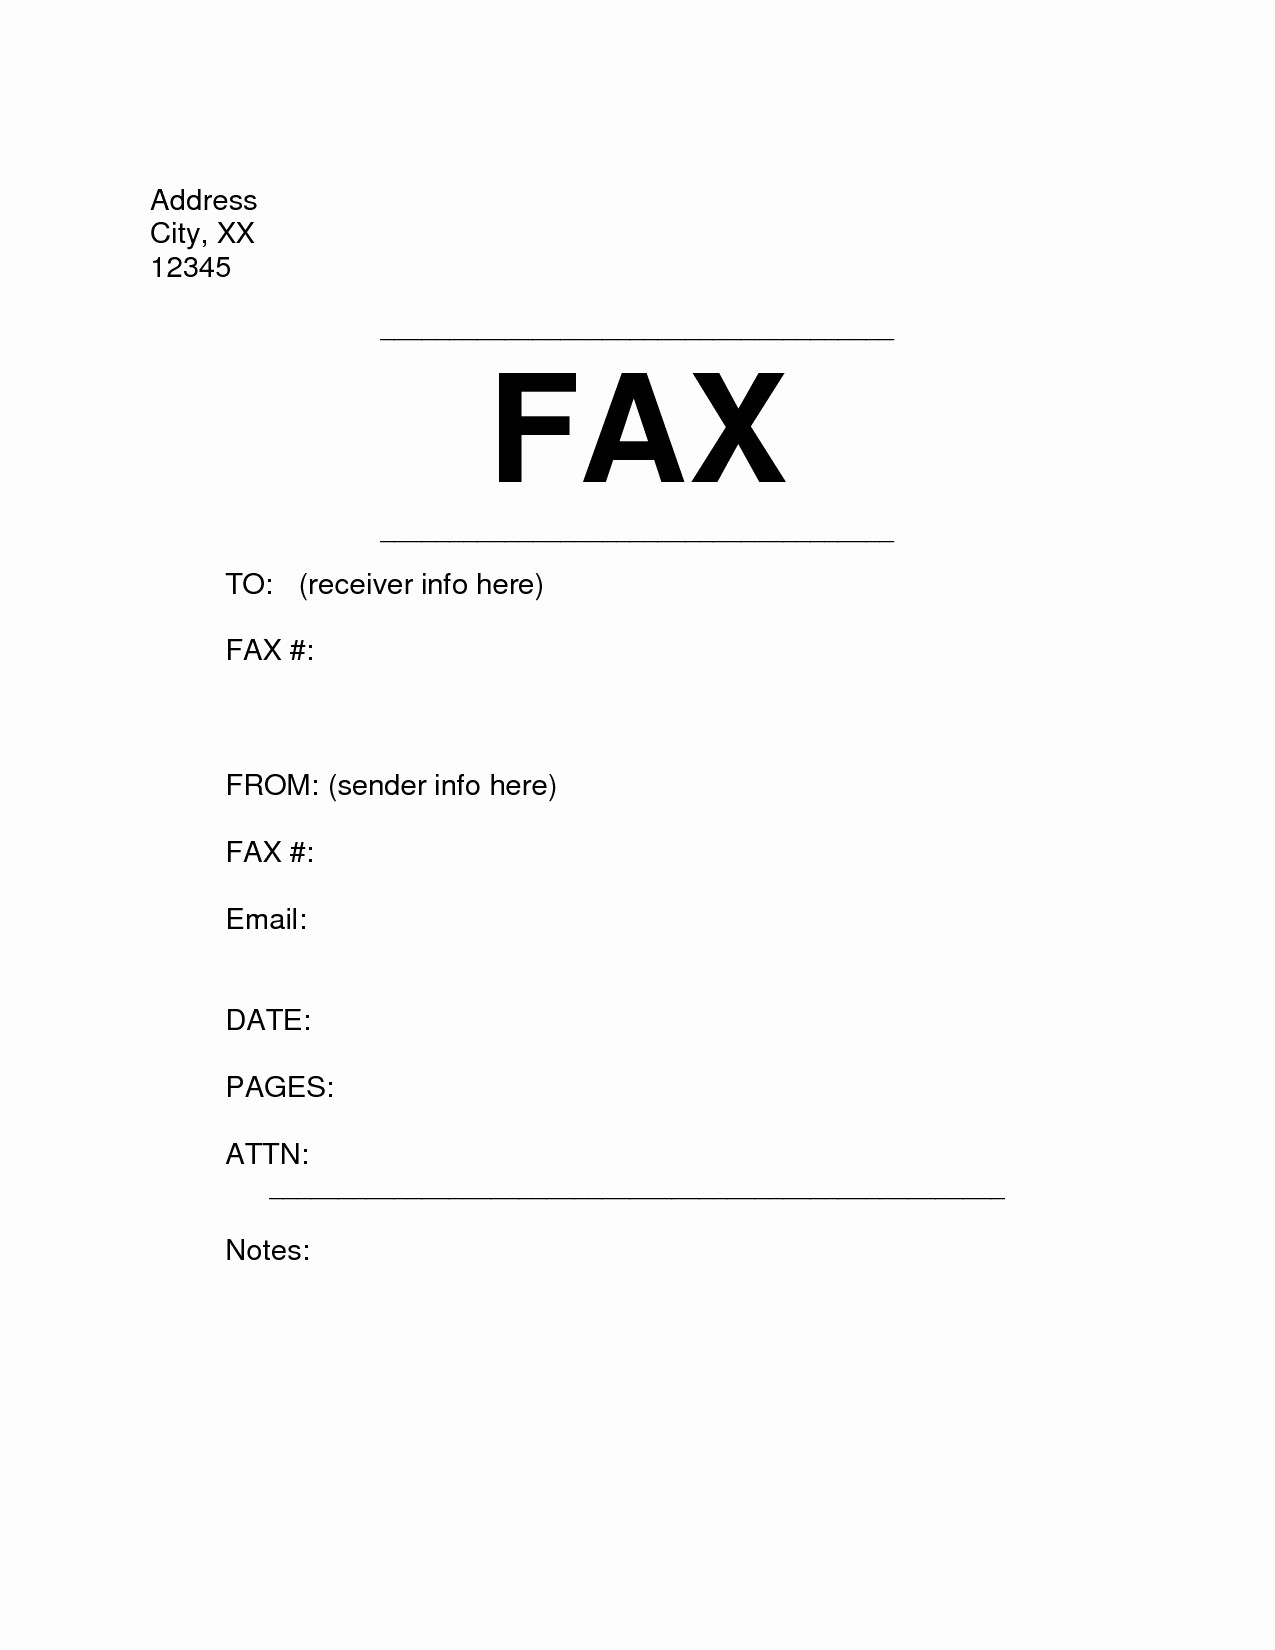 Make A Fax Cover Sheet Fresh Microsoft Fice Fax Cover Sheet Template